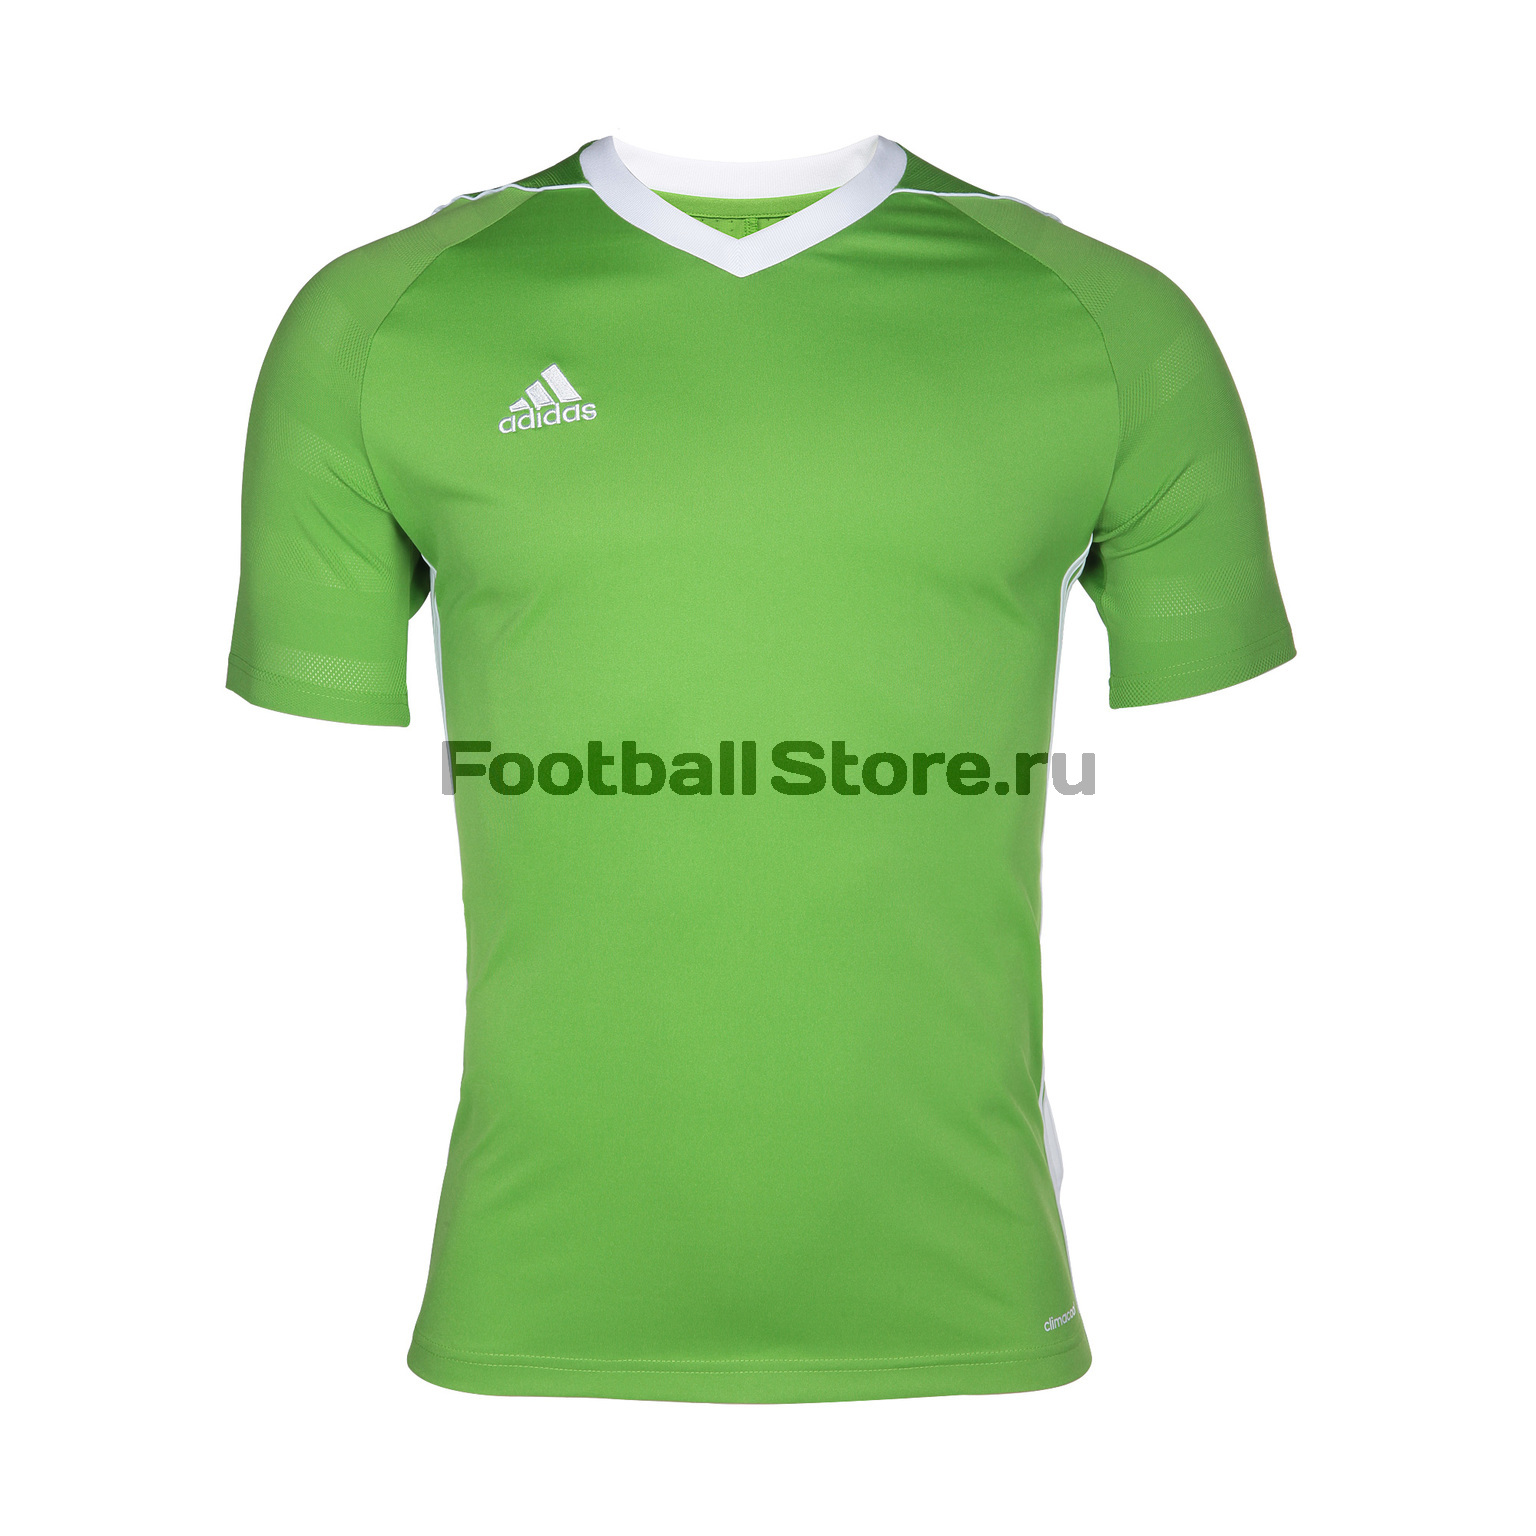 Футболка тренировочная Adidas Tiro17 JSY BK5428